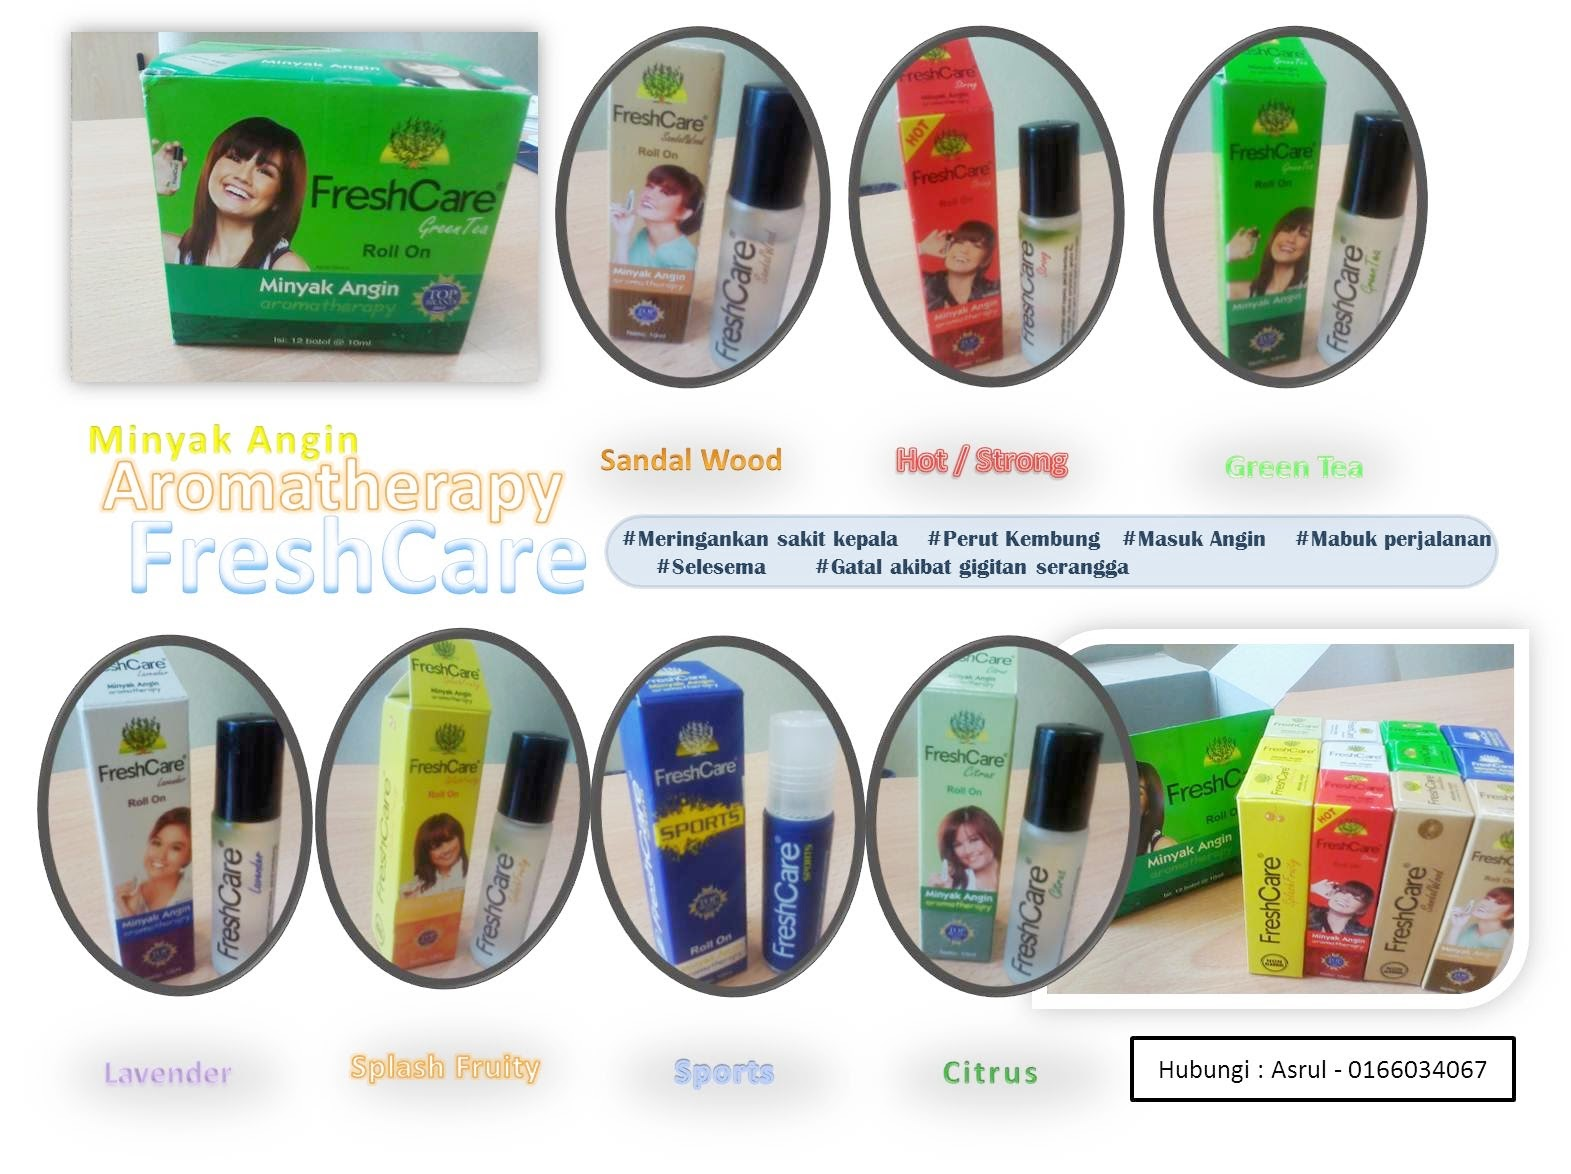 http://kampung-kameq.blogspot.com/2014/07/segar-bersama-fresh-care-dan-safe-care.html